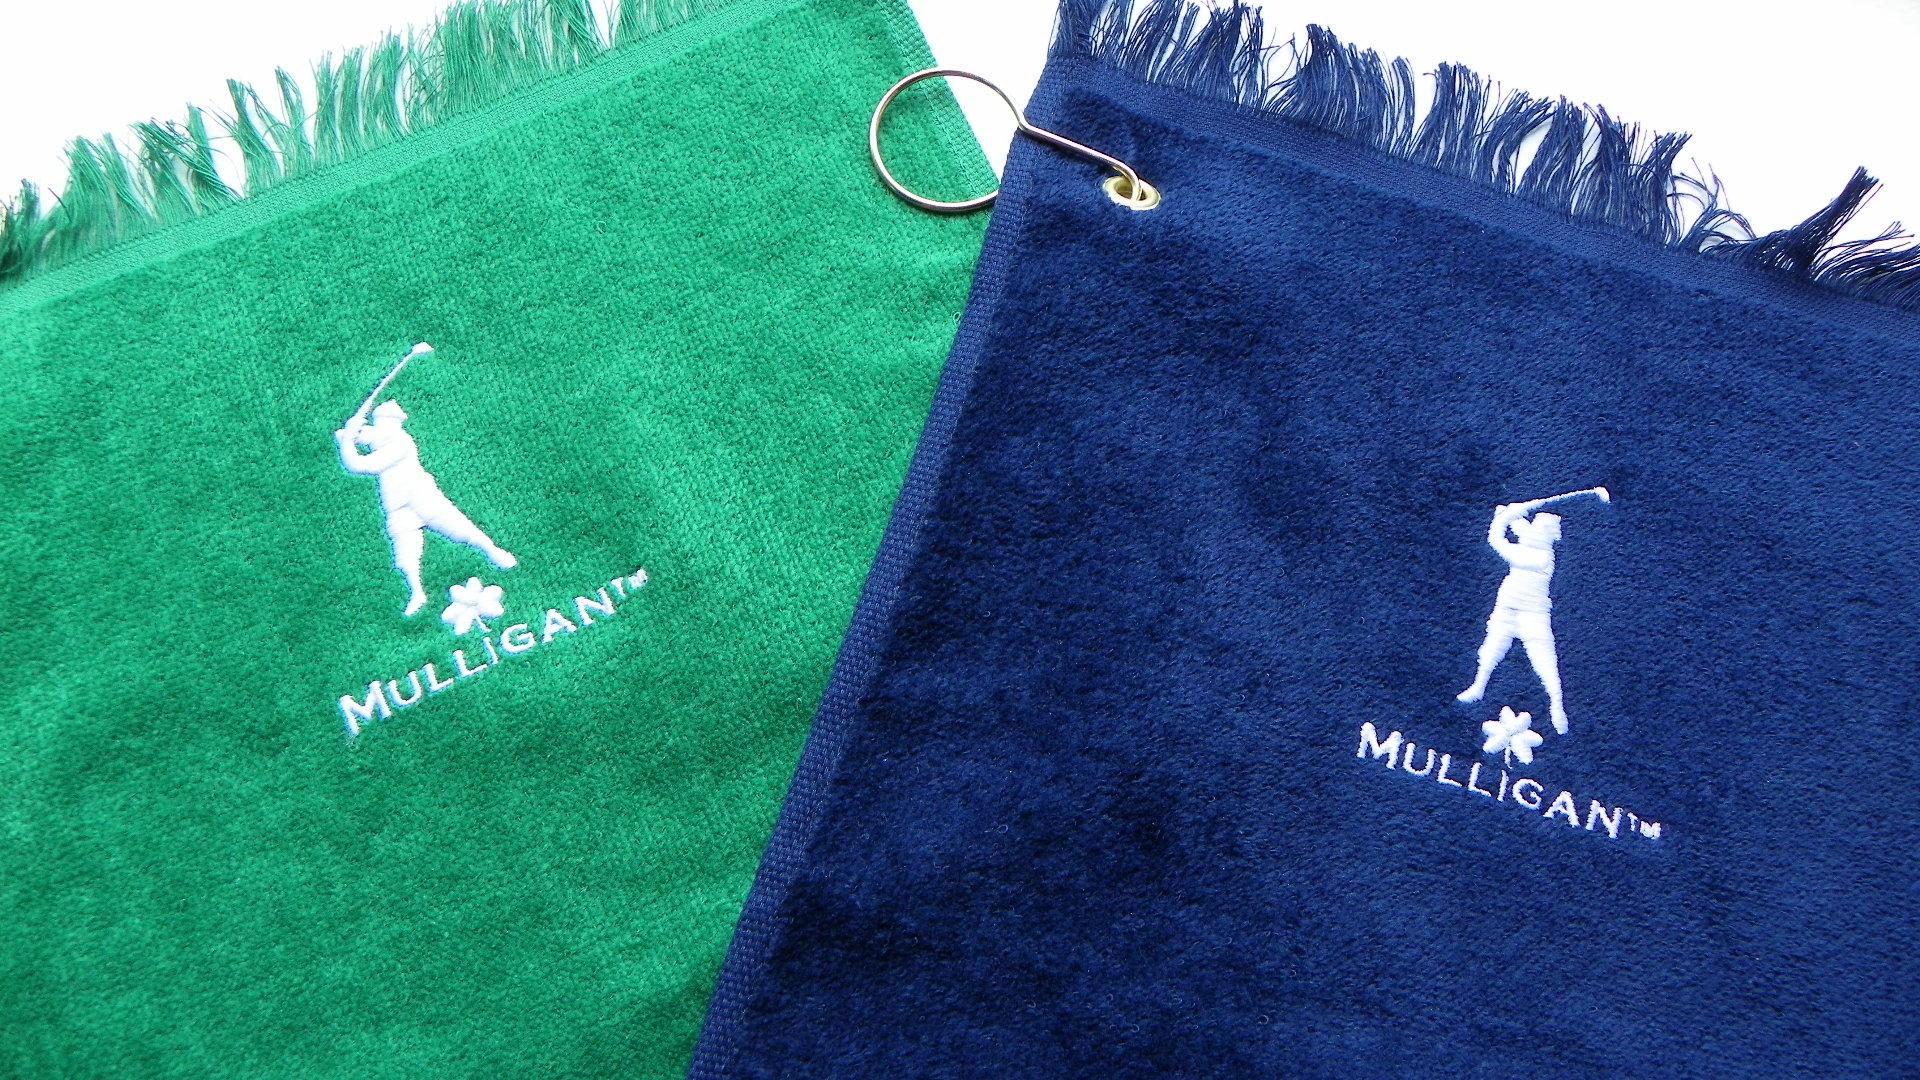 Mulligan Golf Towel- Everyone deserves a Mulligan